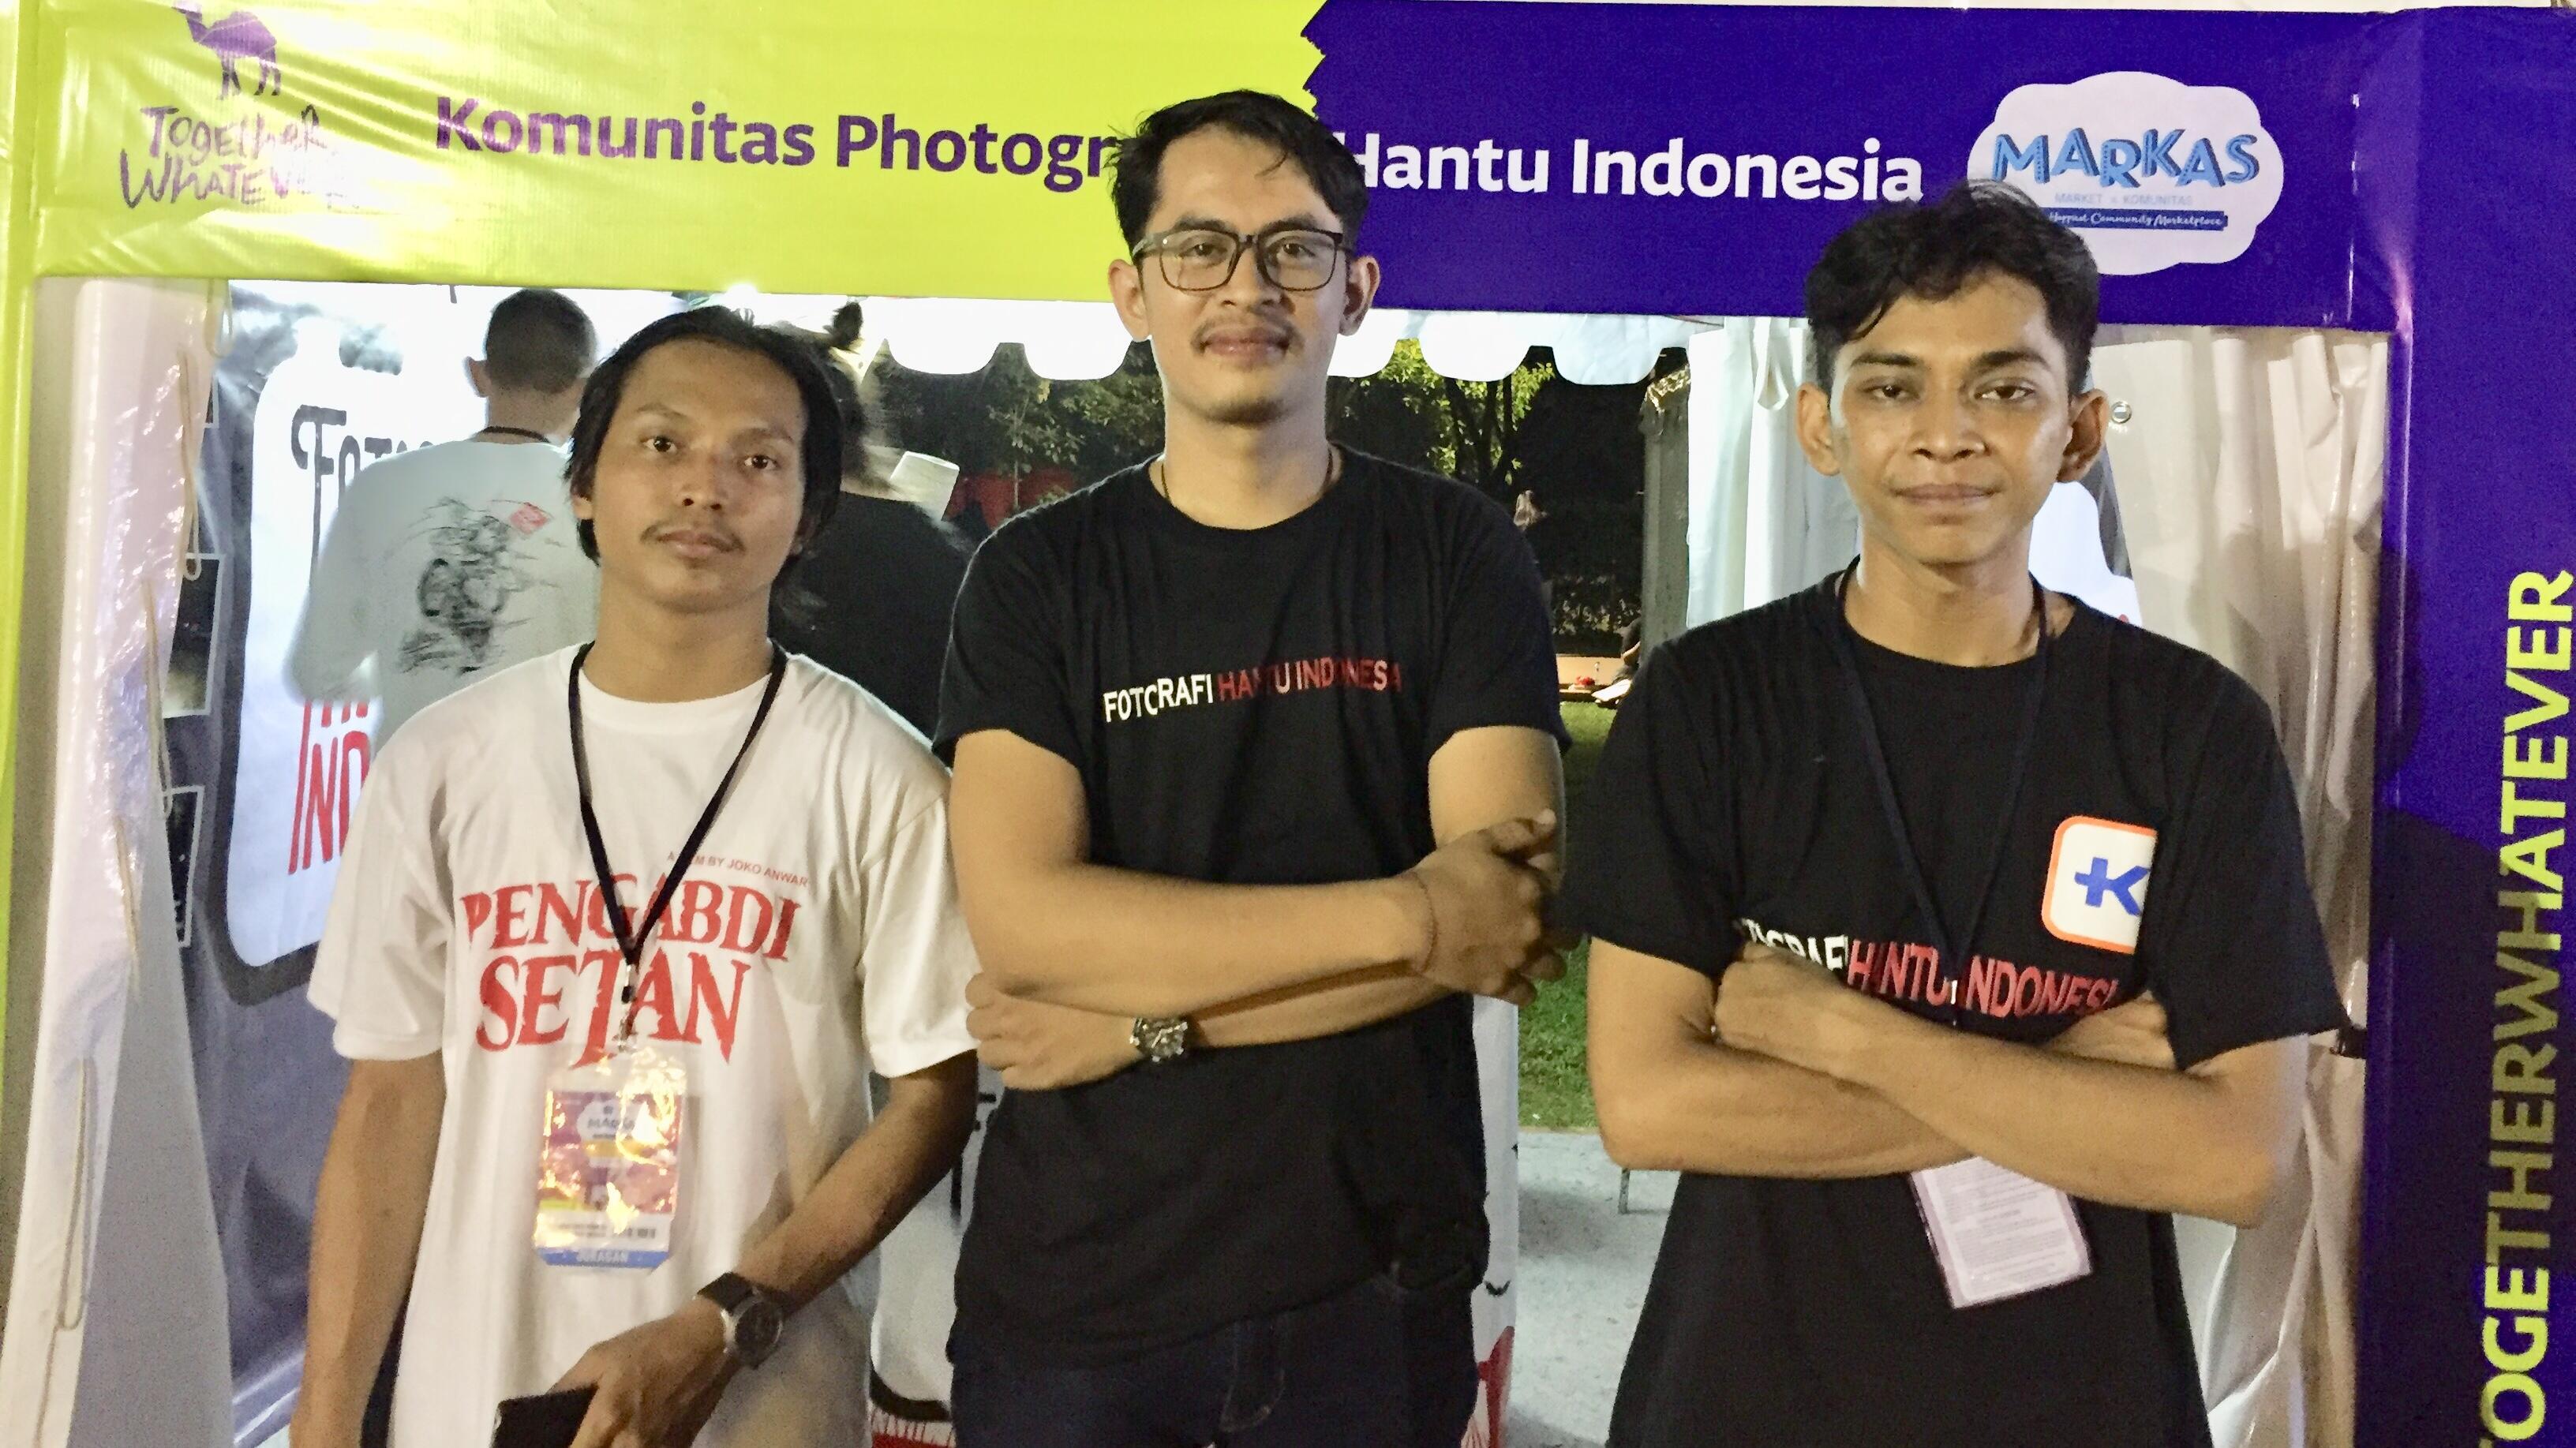 Cara Komunitas Fotografi Hantu Indonesia Ambil Foto Penampakan